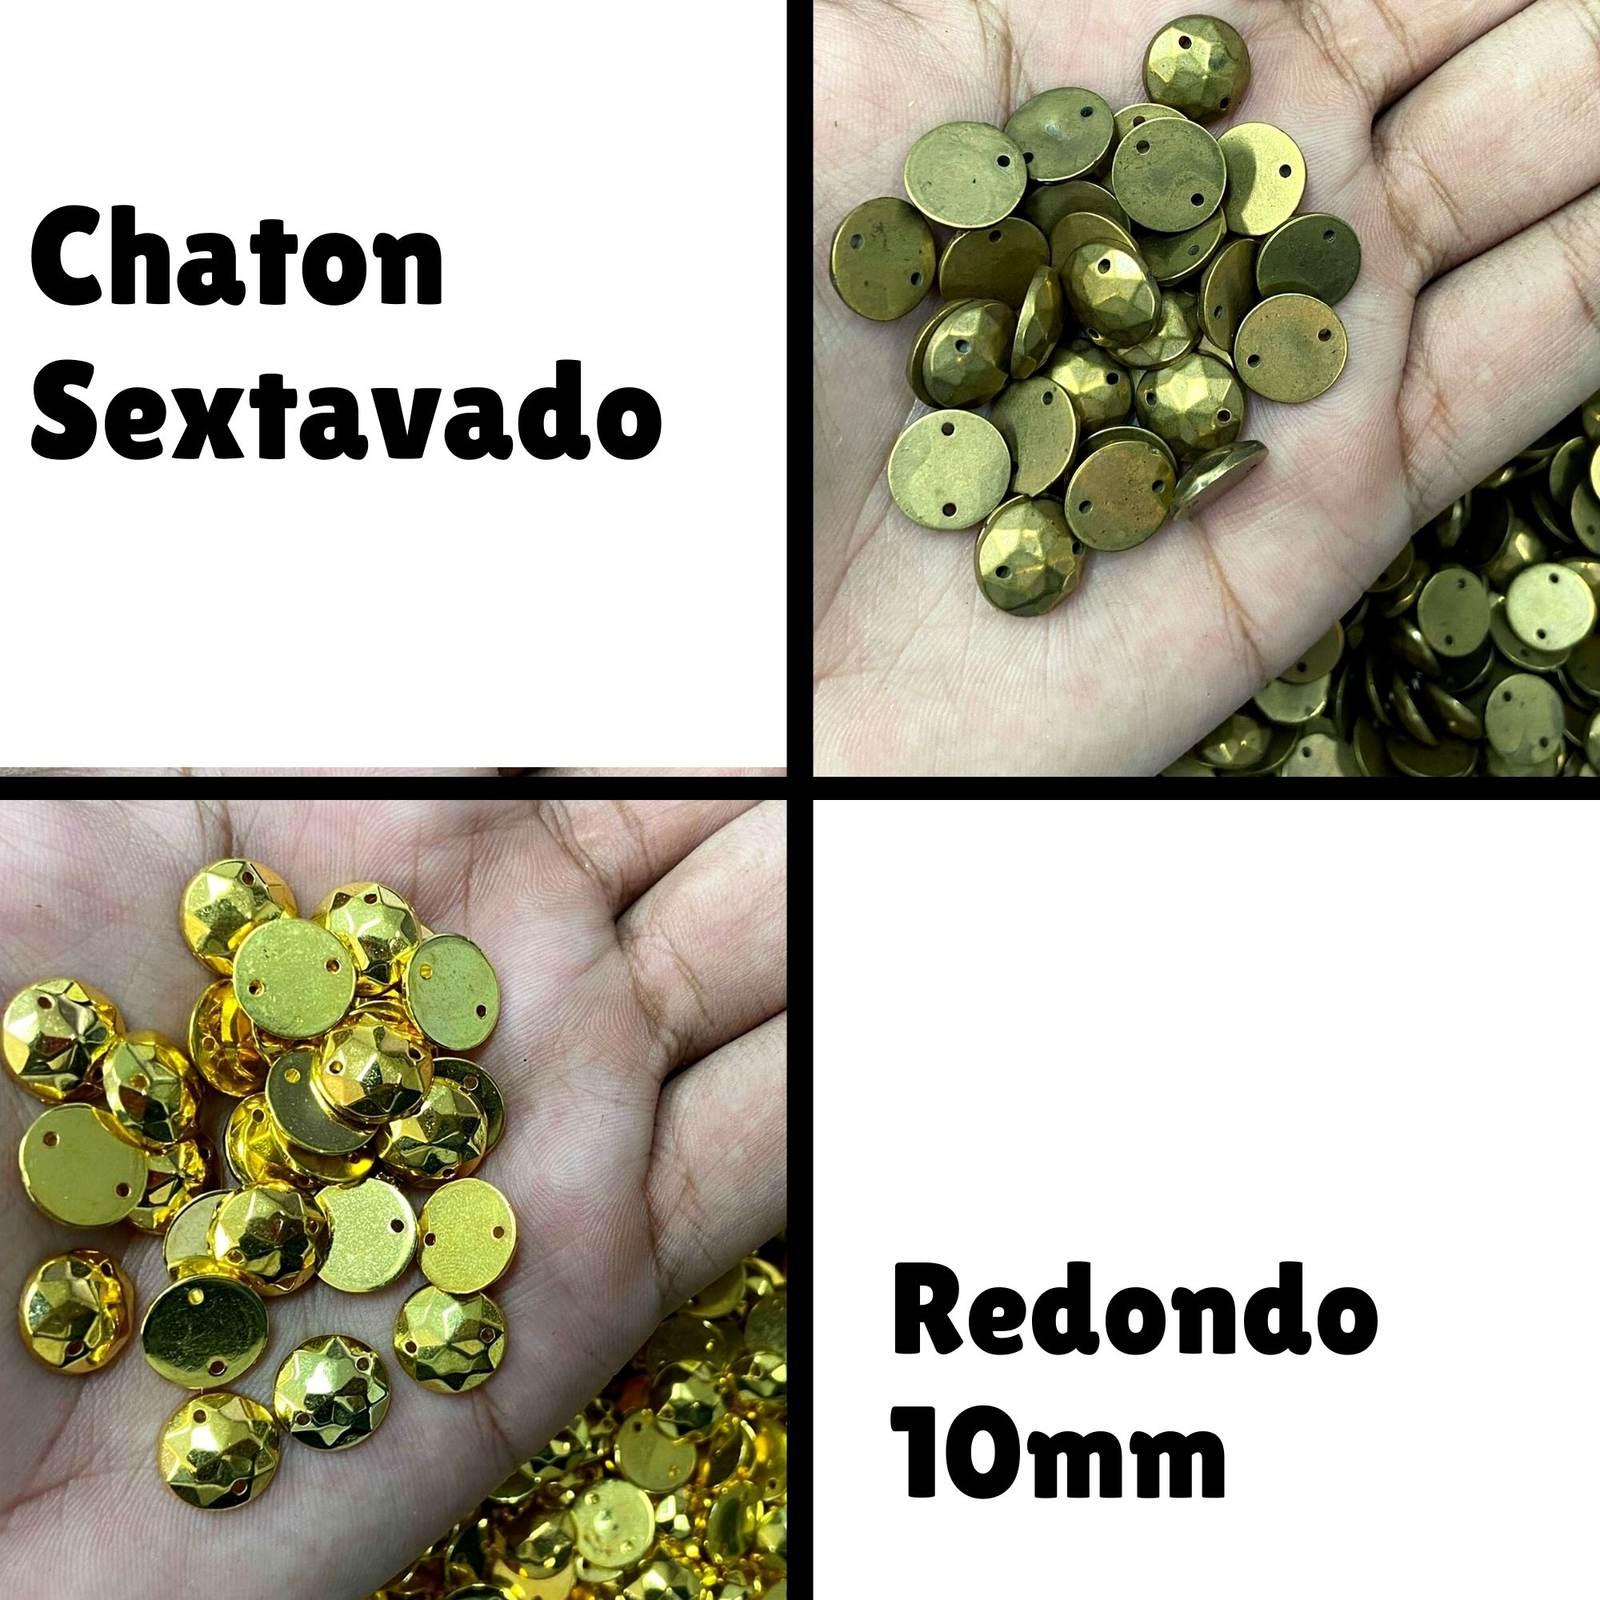 Chaton ABS  Redondo Sextavado 10mm - 250g